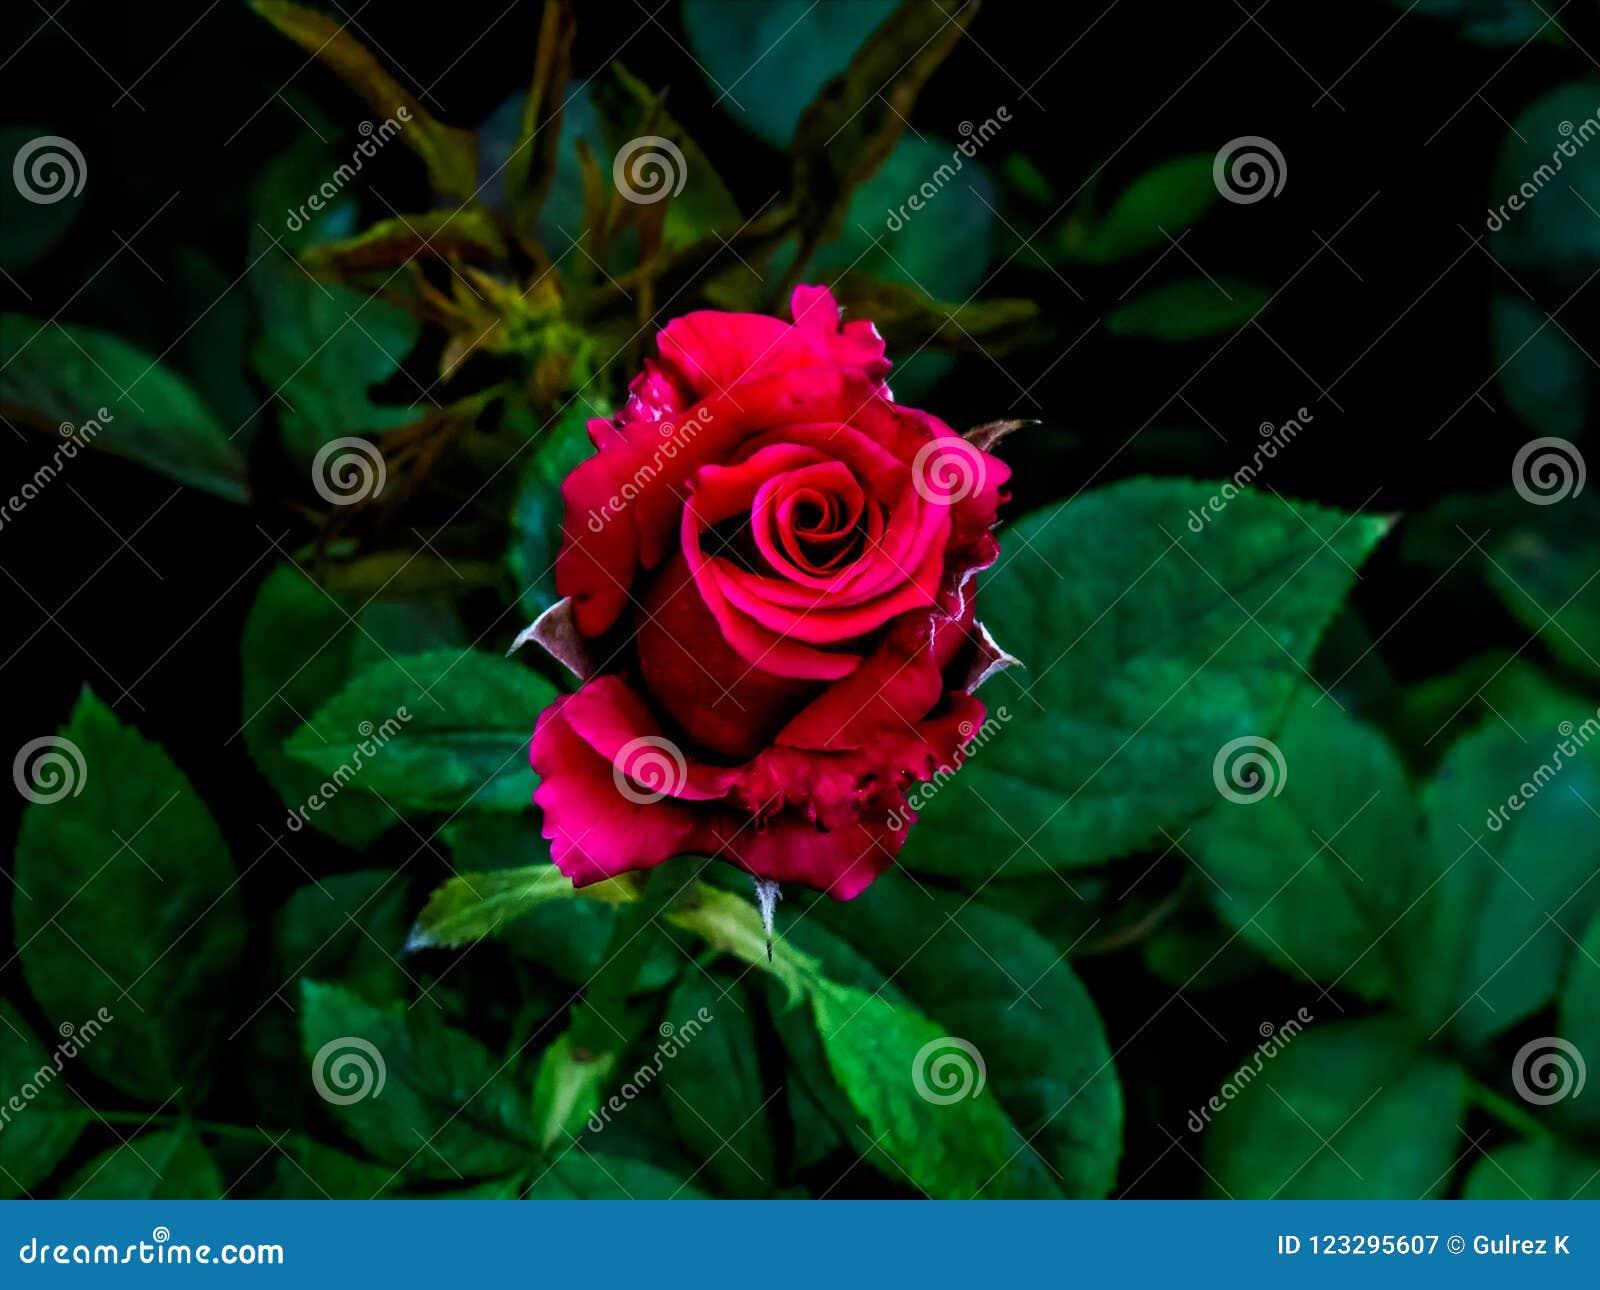 Red Rose in dark green background